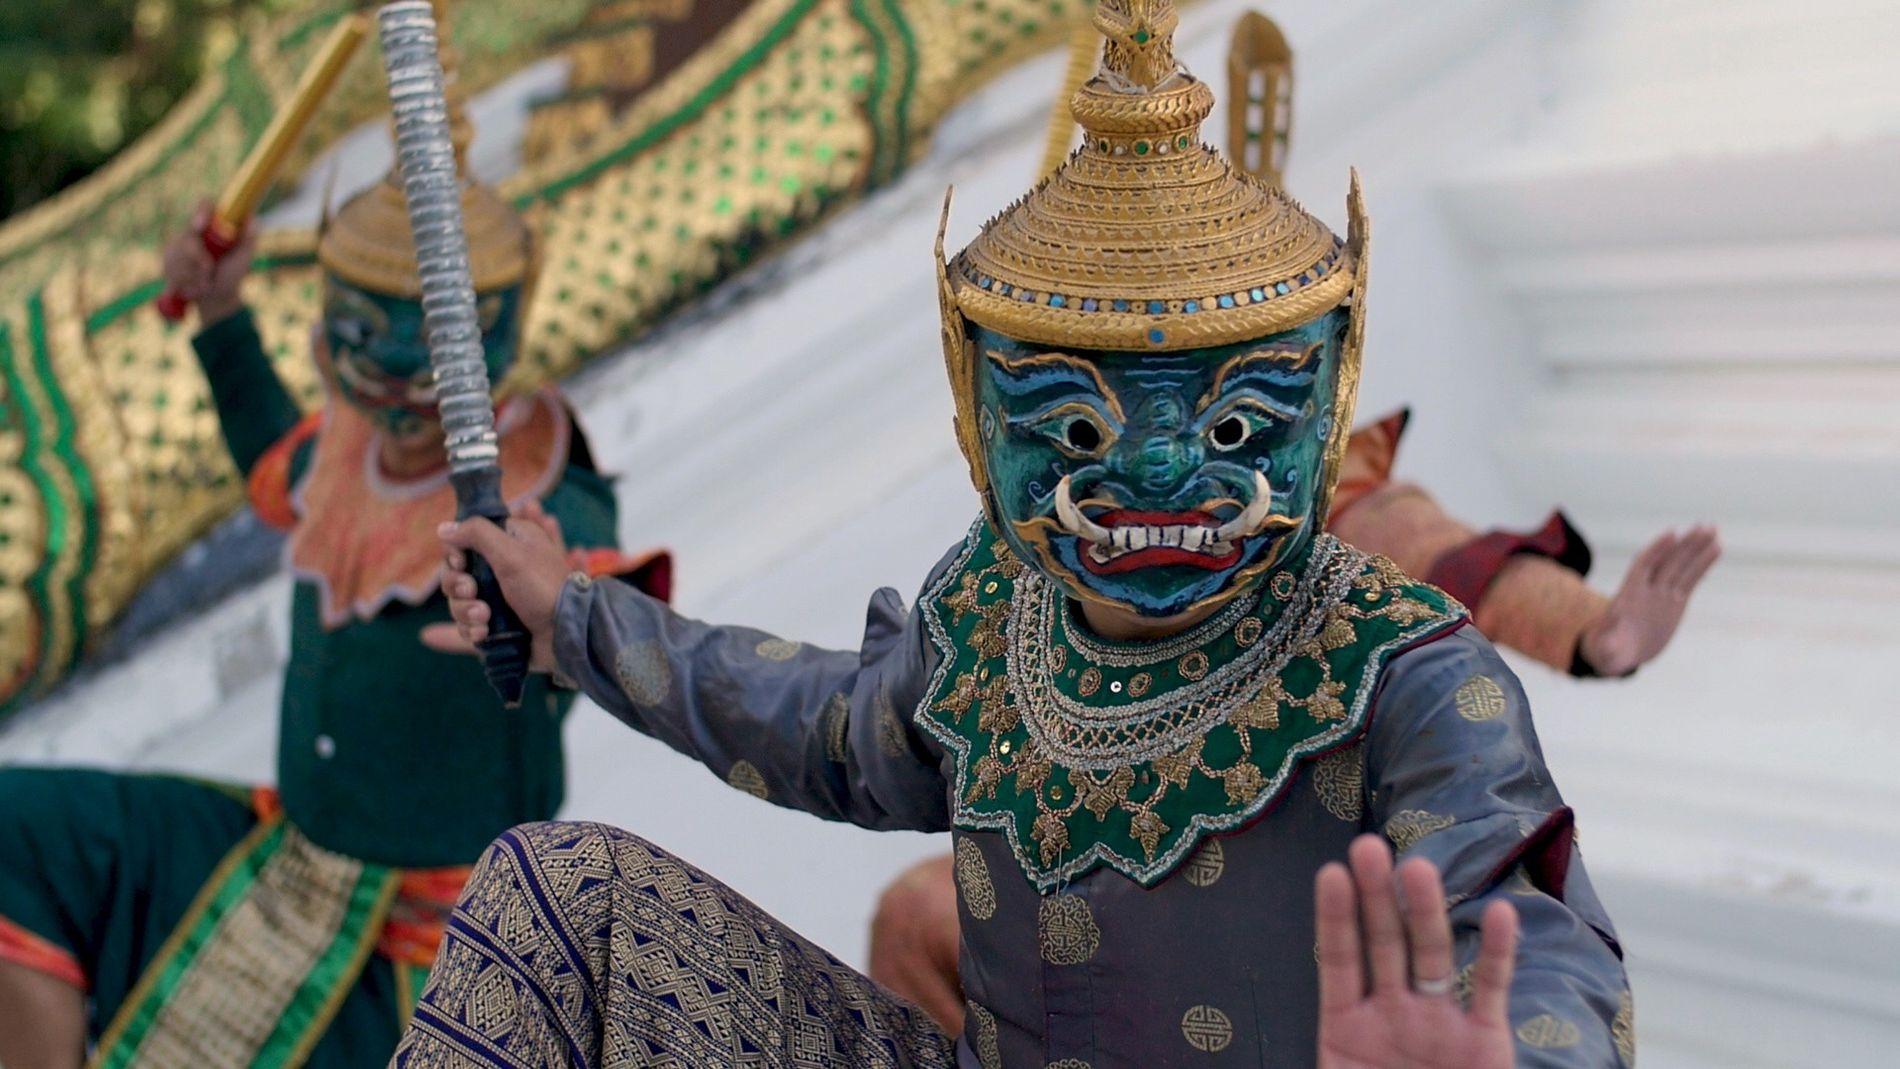 Descubra a Diversidade das Tradições Espirituais e Culturais de Laos